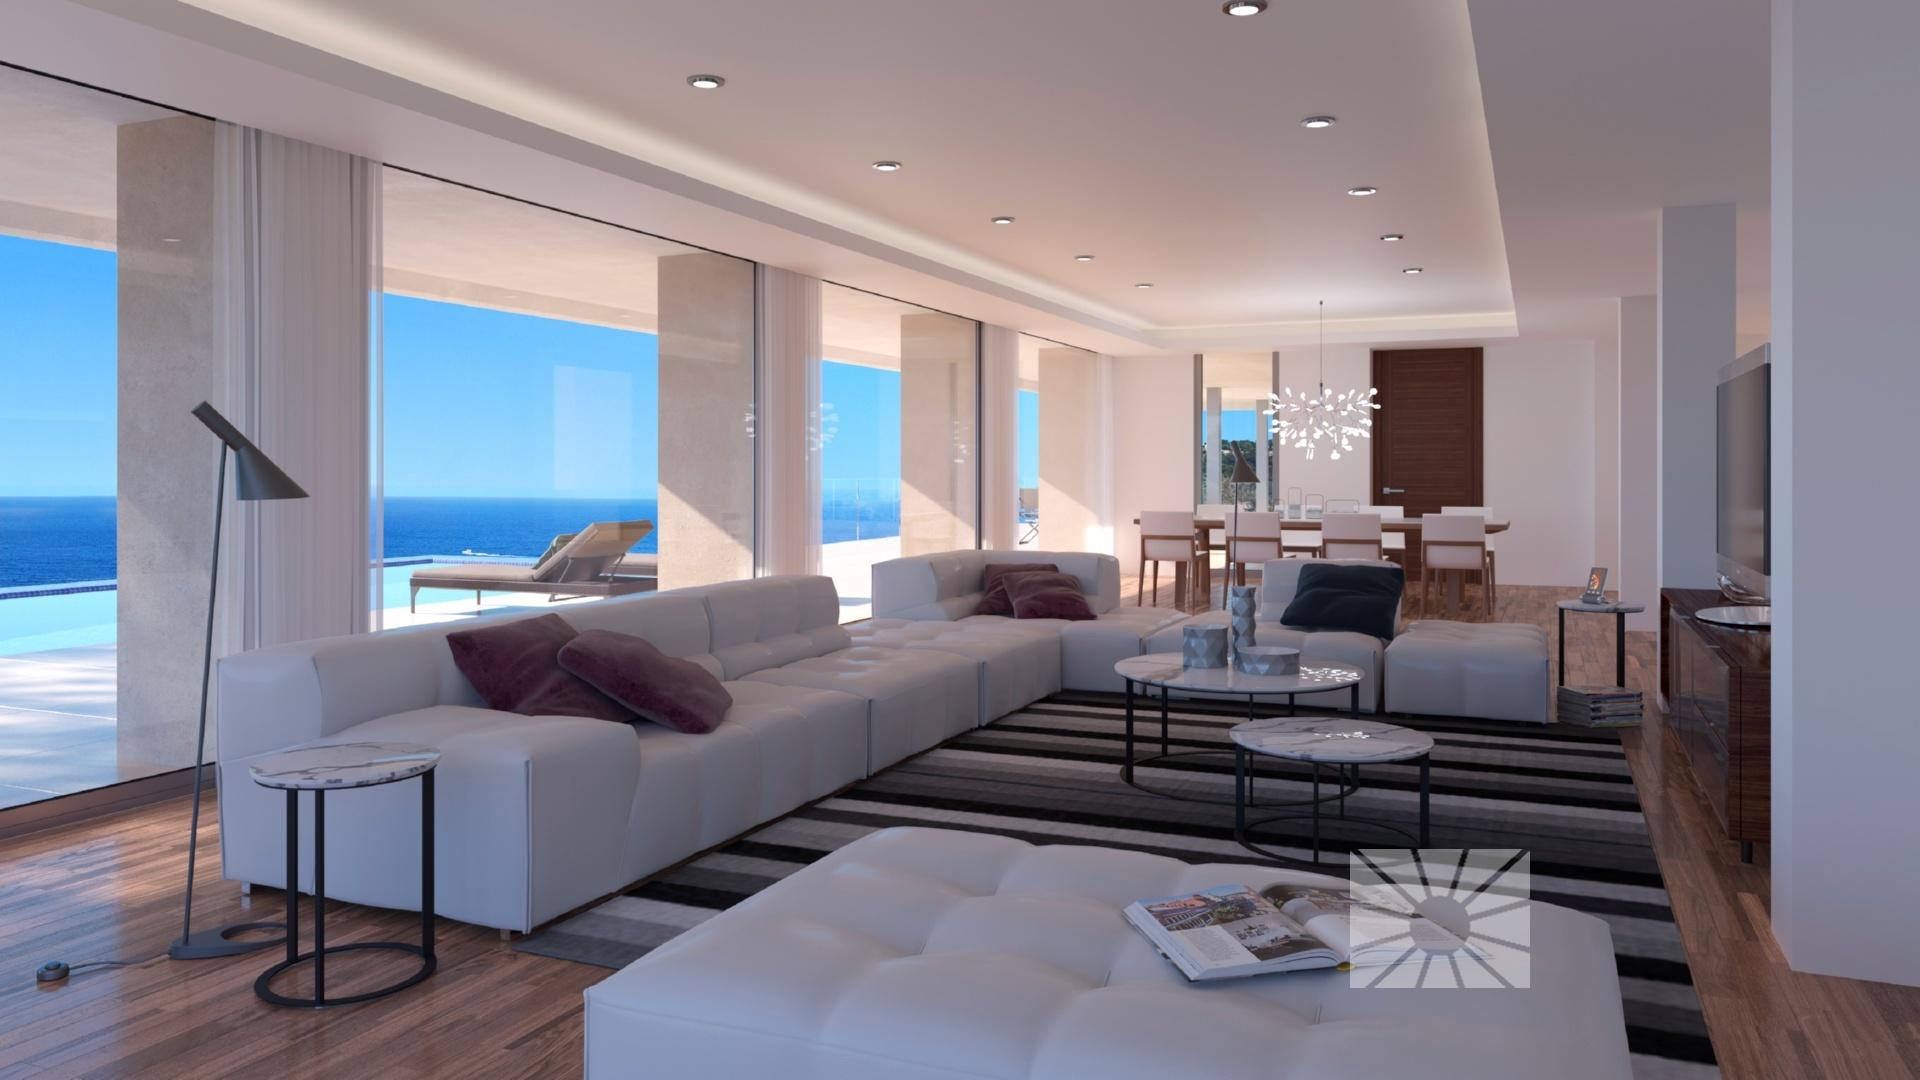 Beautiful interieur villa moderne photos awesome for Decoration interieur